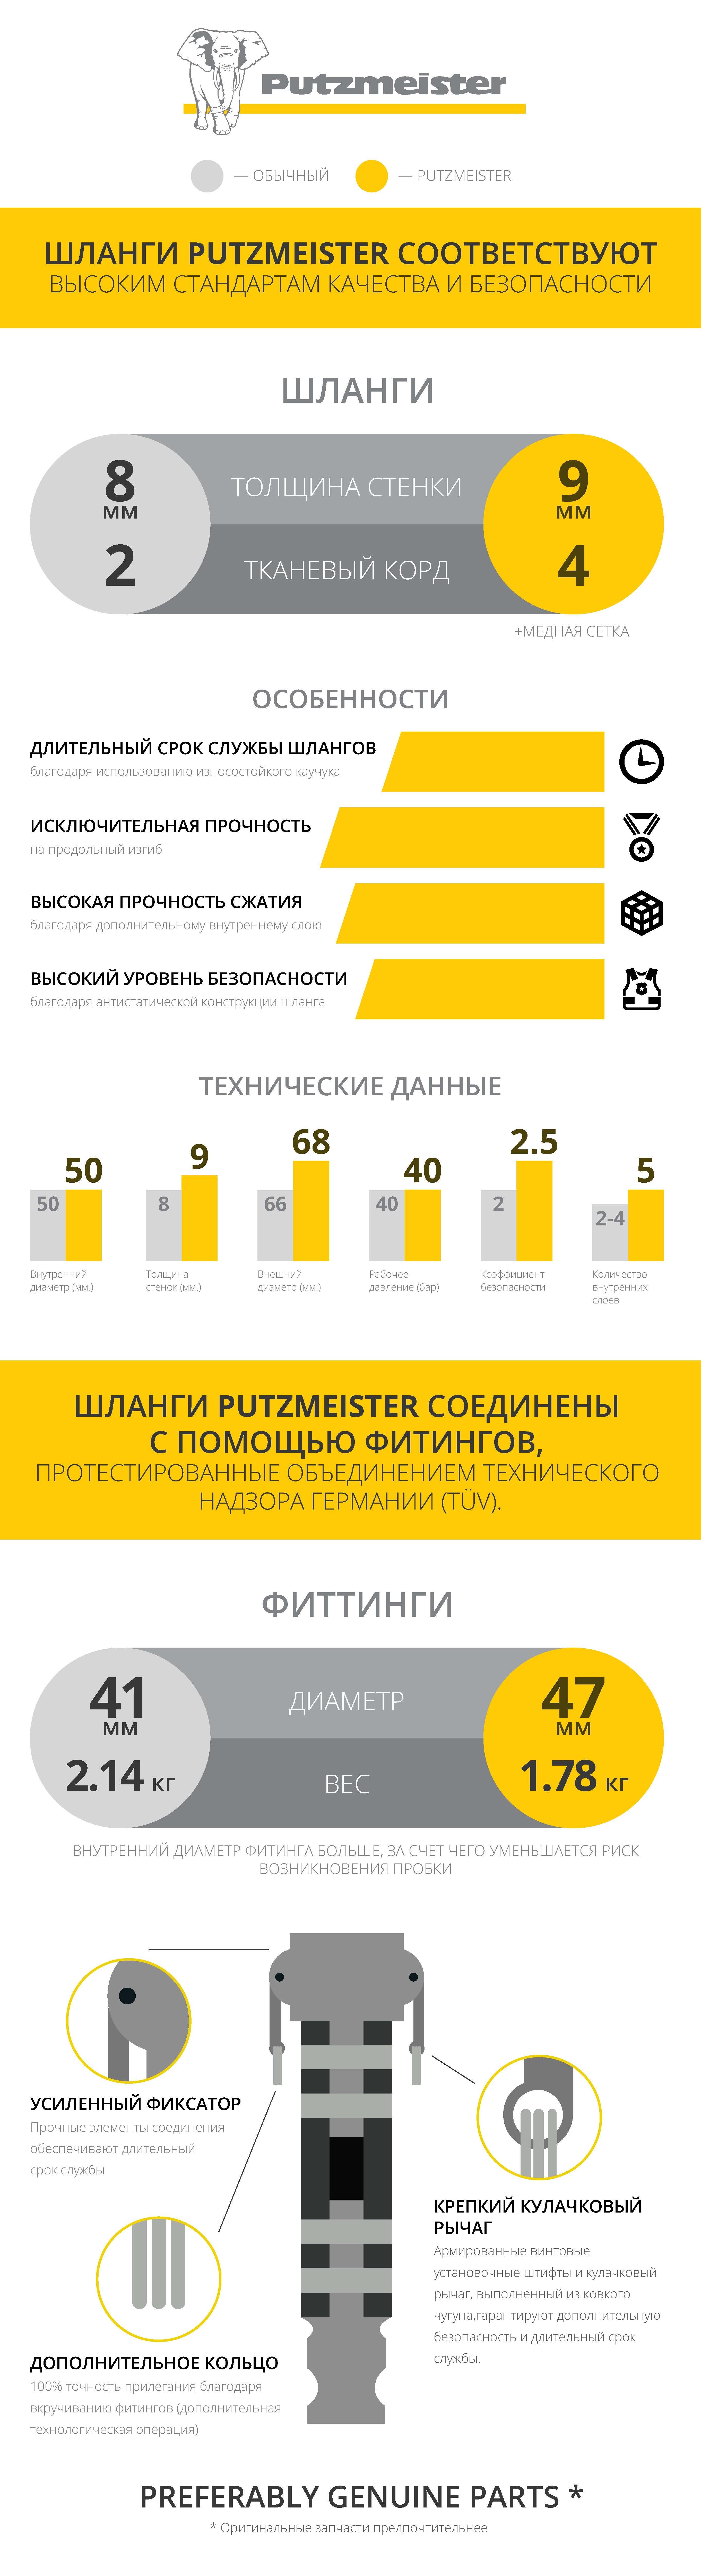 infogrfika